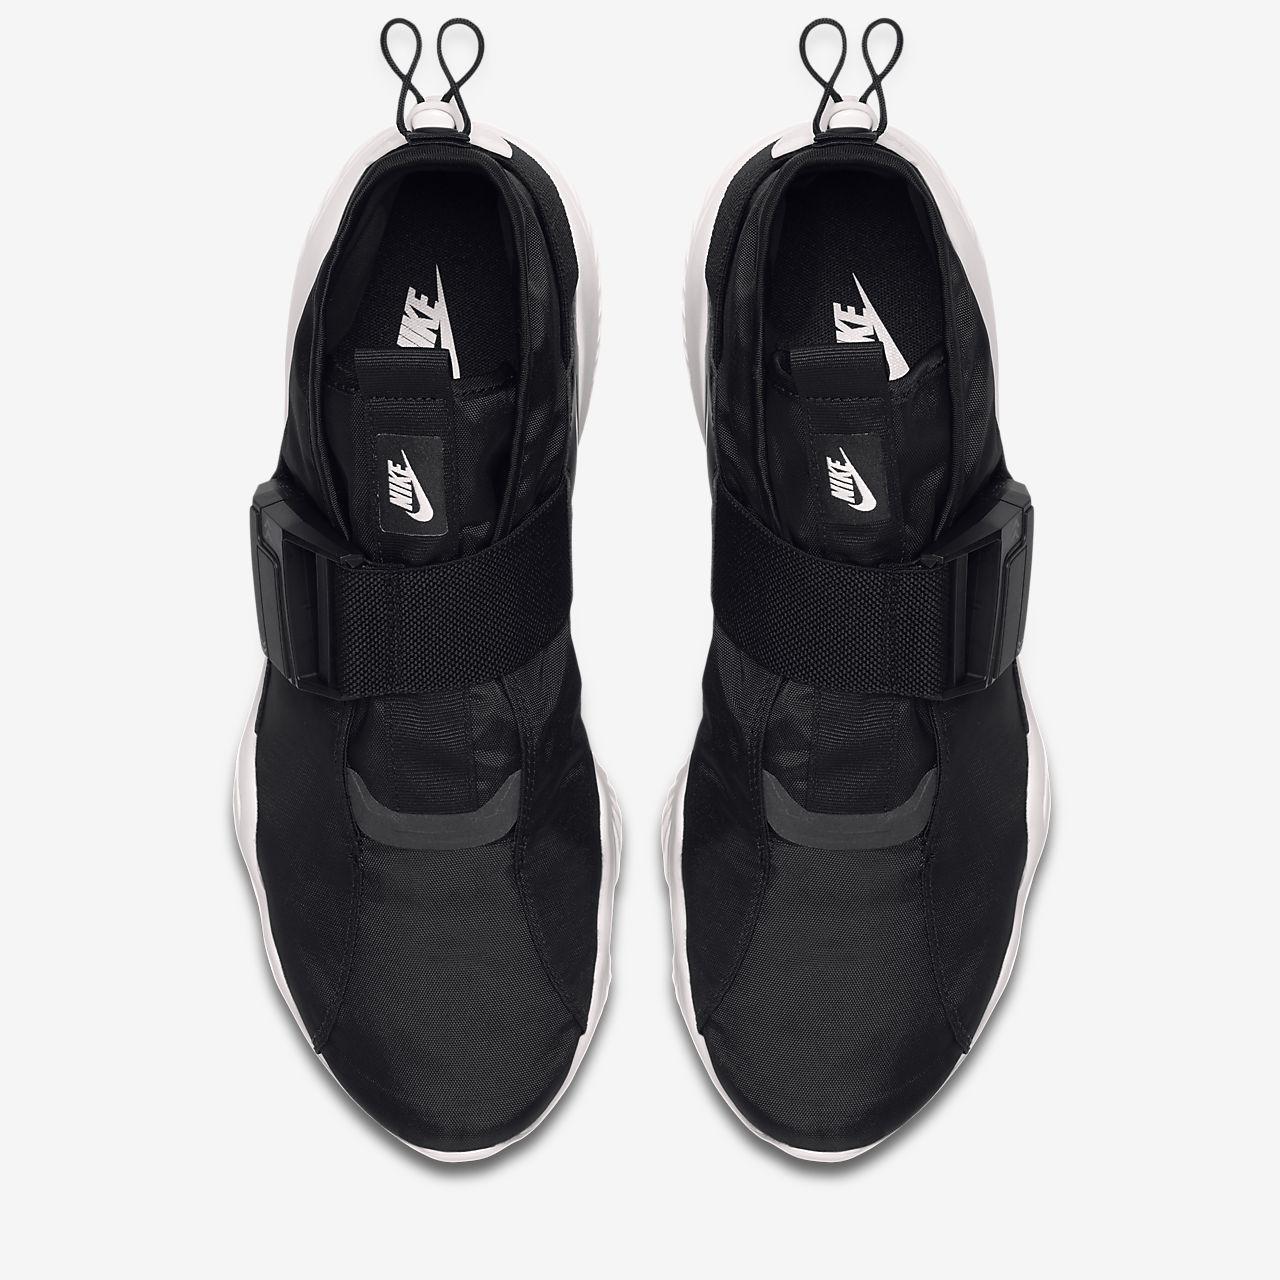 premium selection c3a88 735e5 Low Resolution Nike Komyuter Zapatillas - Hombre Nike Komyuter Zapatillas -  Hombre